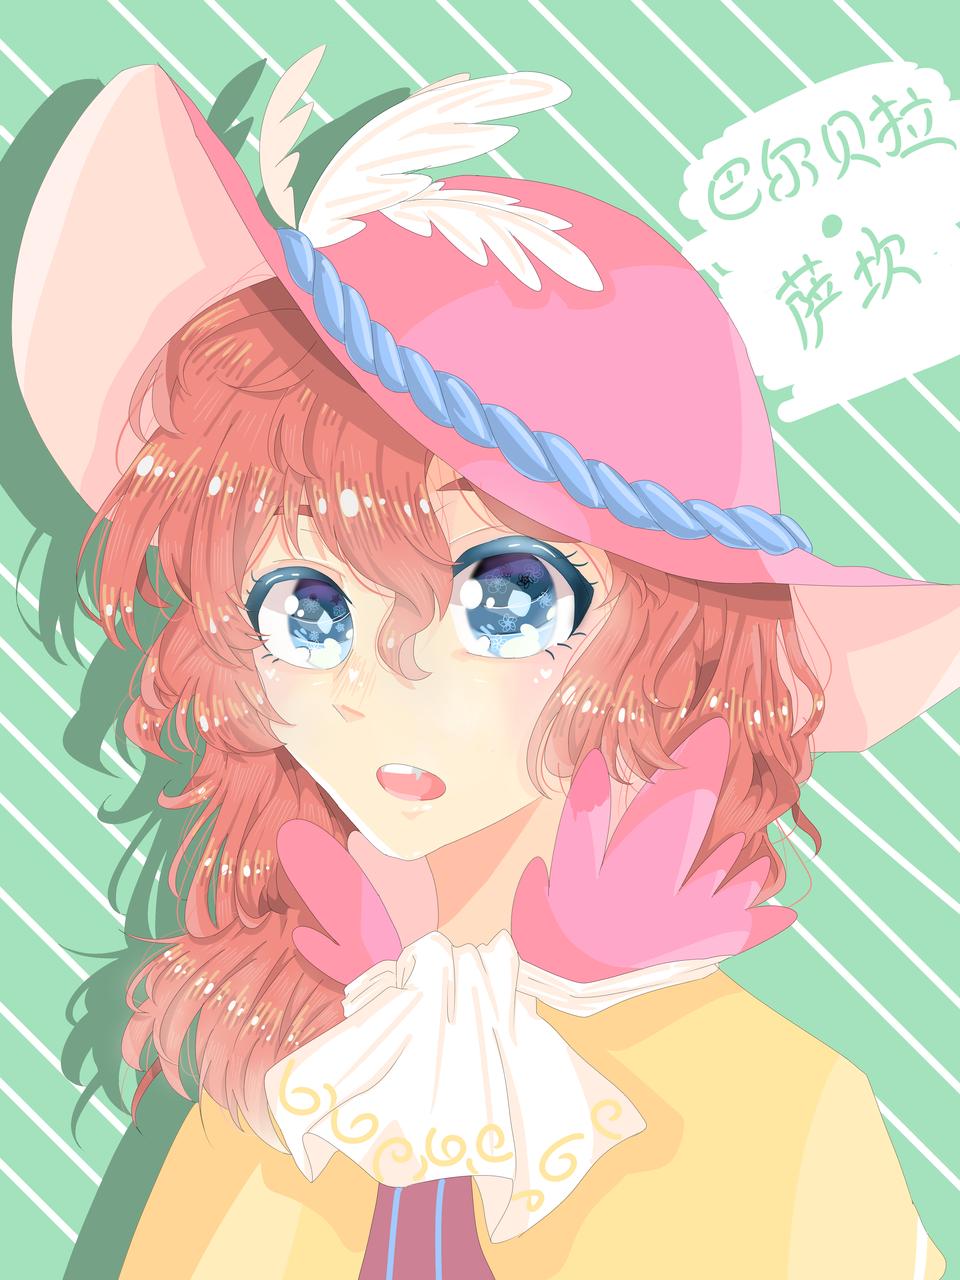 巴尔贝拉·萨坎 Illust of Nanako chan medibangpaint 螺旋圆舞曲 同人